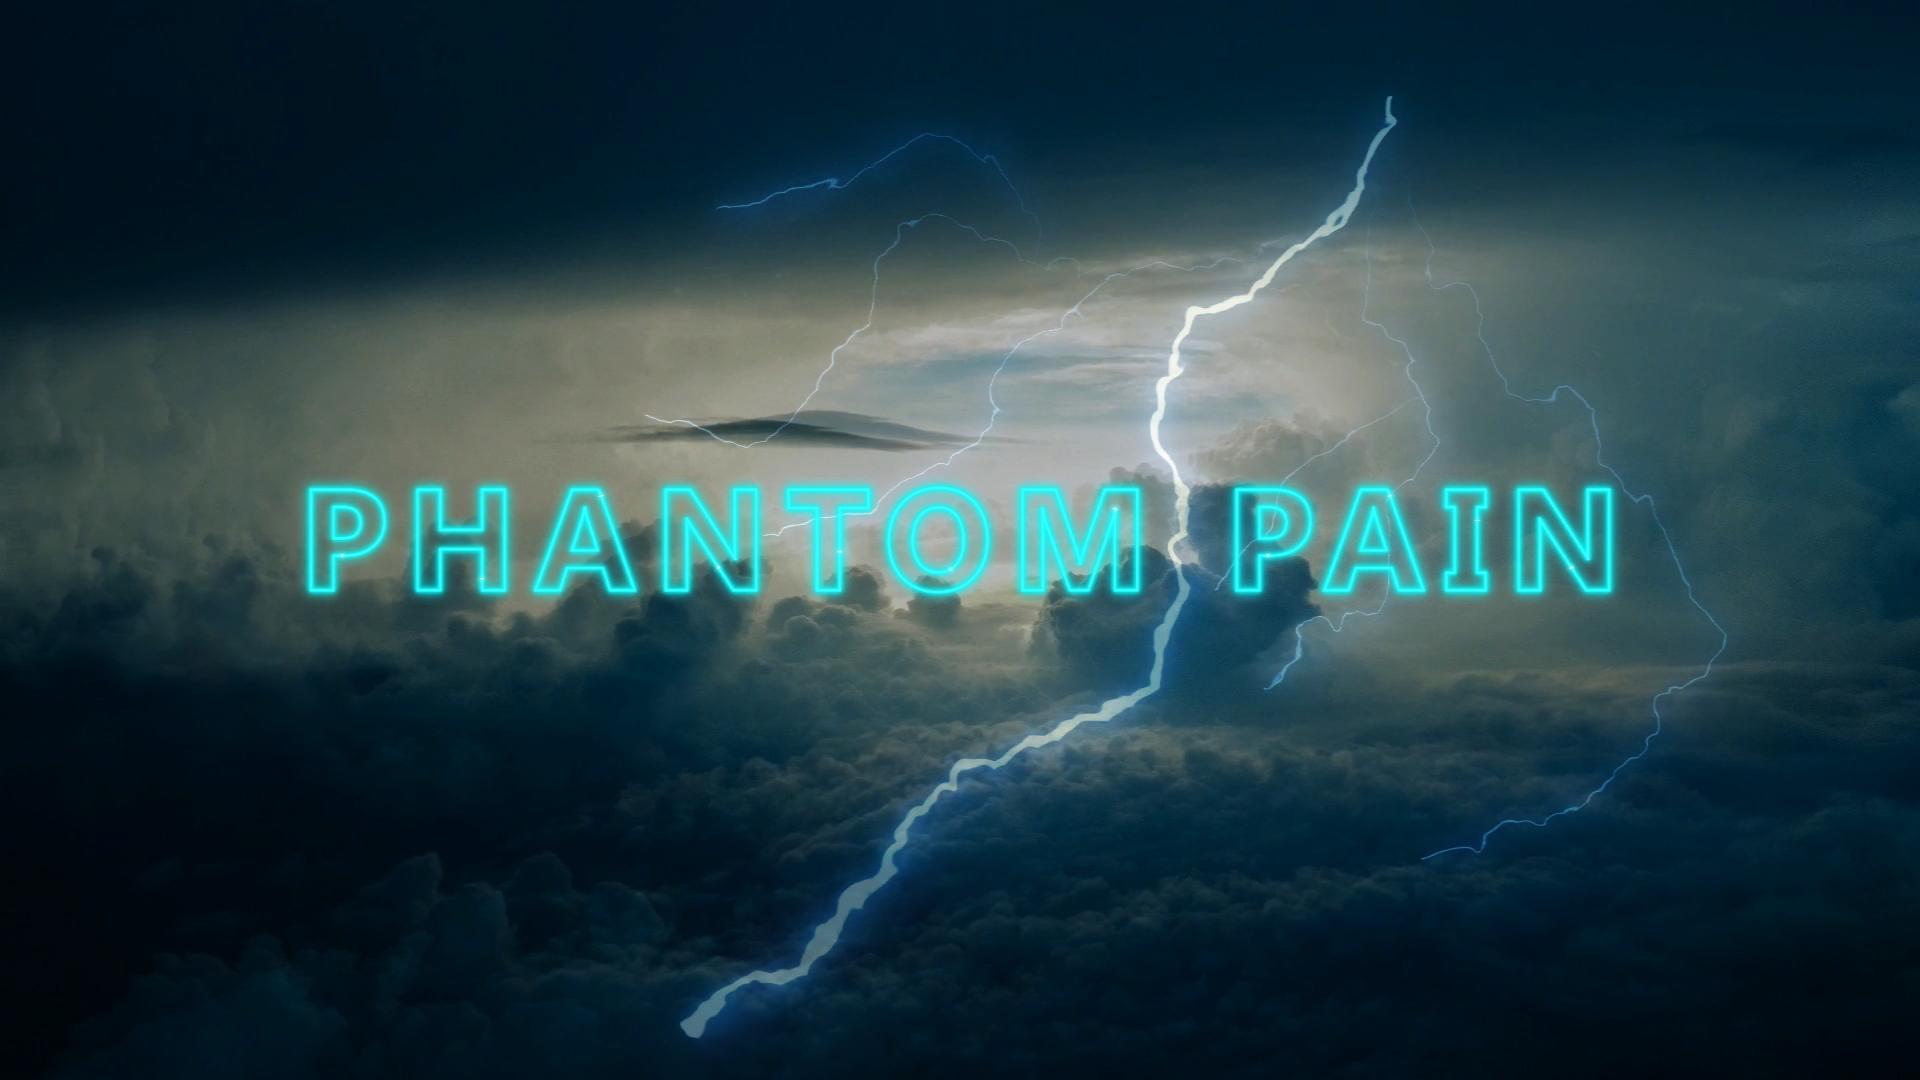 phantompain